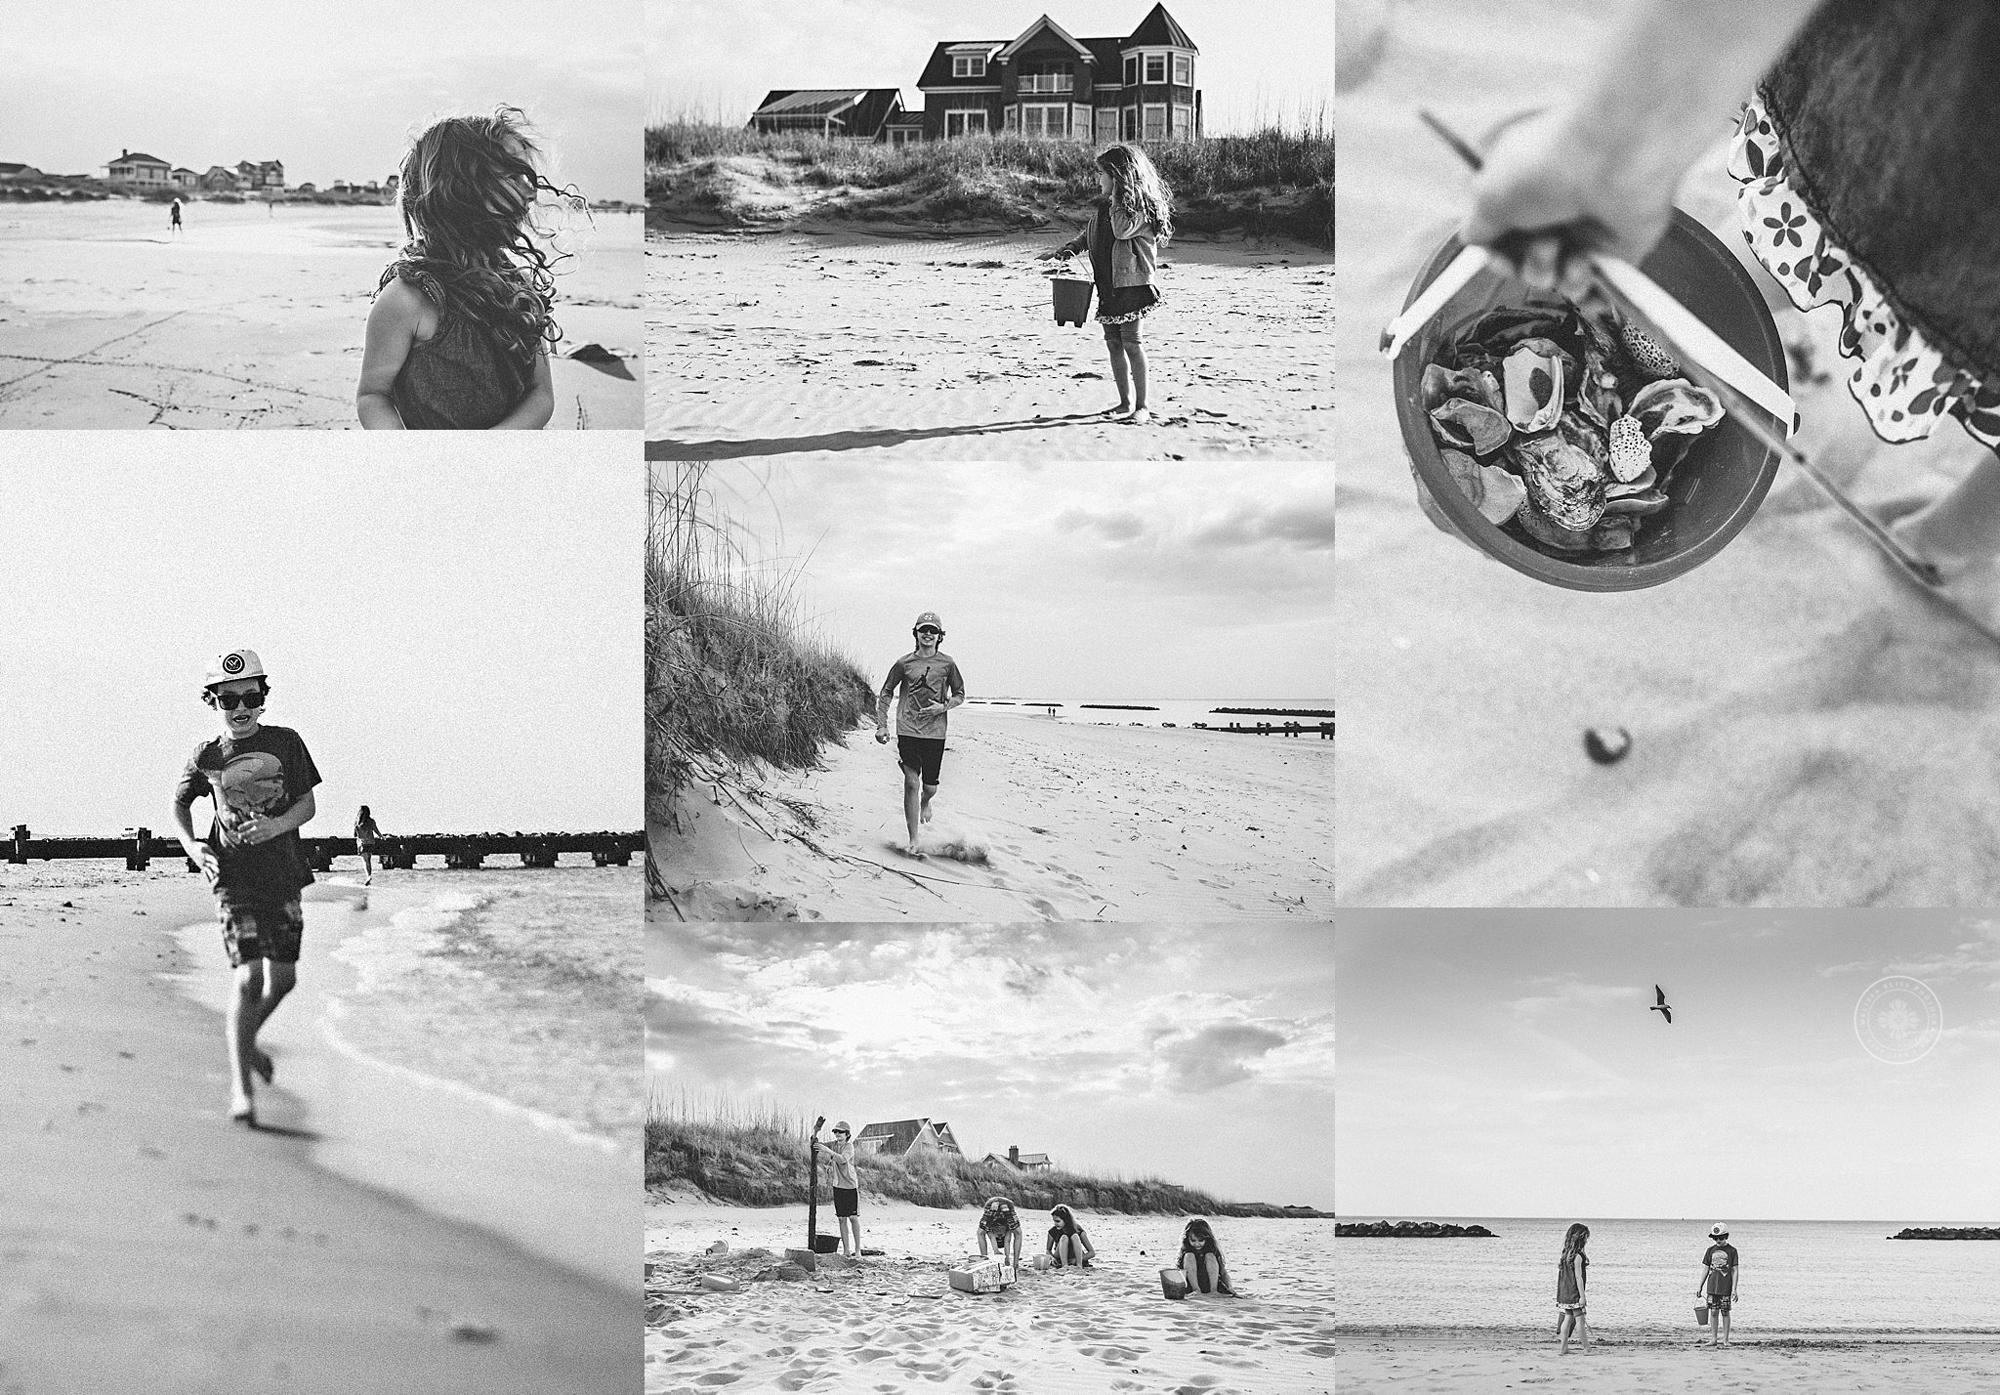 sandbridge-photographers-documentary-day-at-the-beach-black-white-photos-melissa-bliss-photography